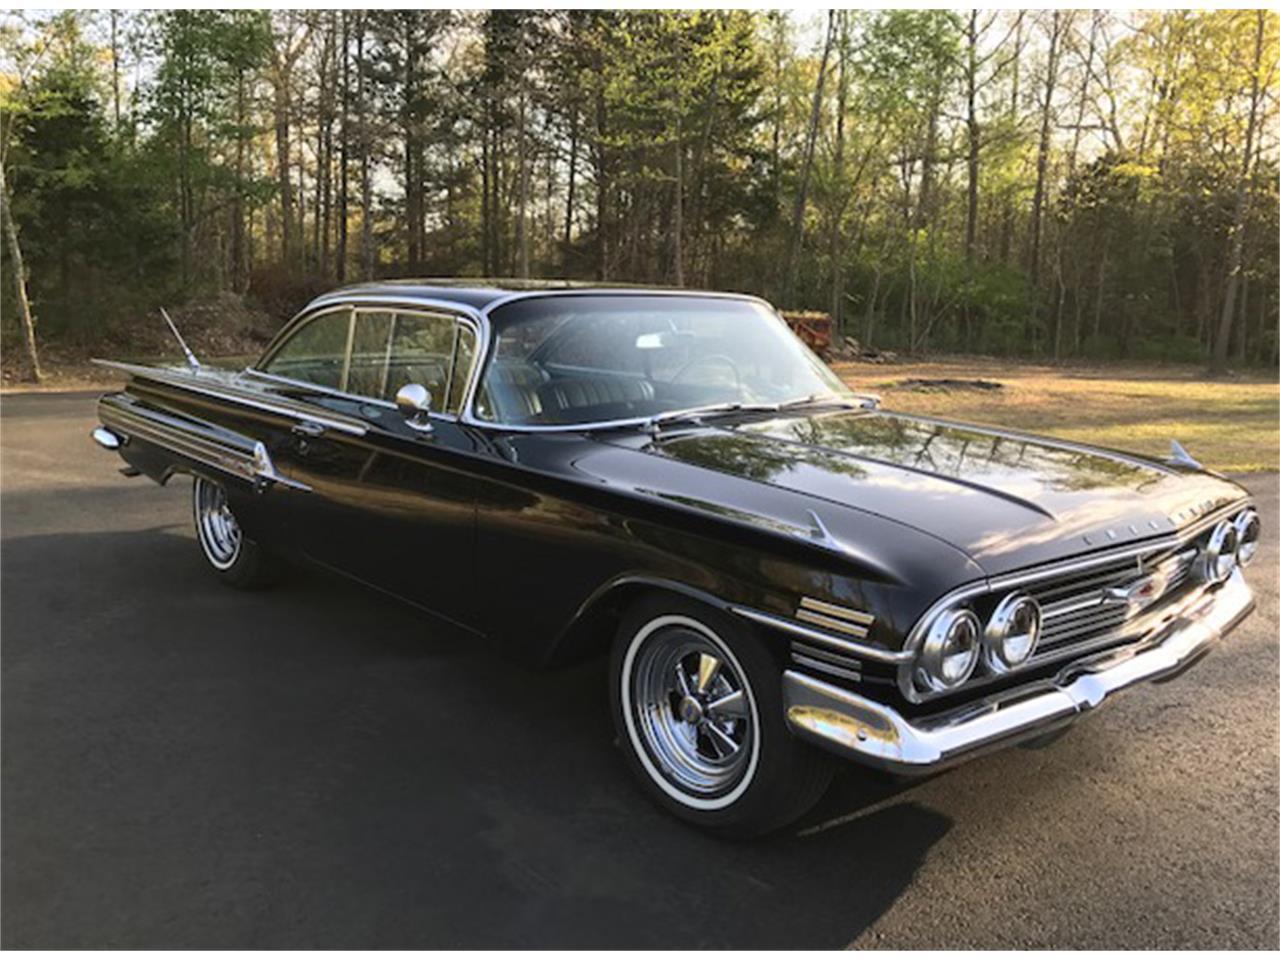 Kekurangan Chevrolet Impala 1960 Spesifikasi